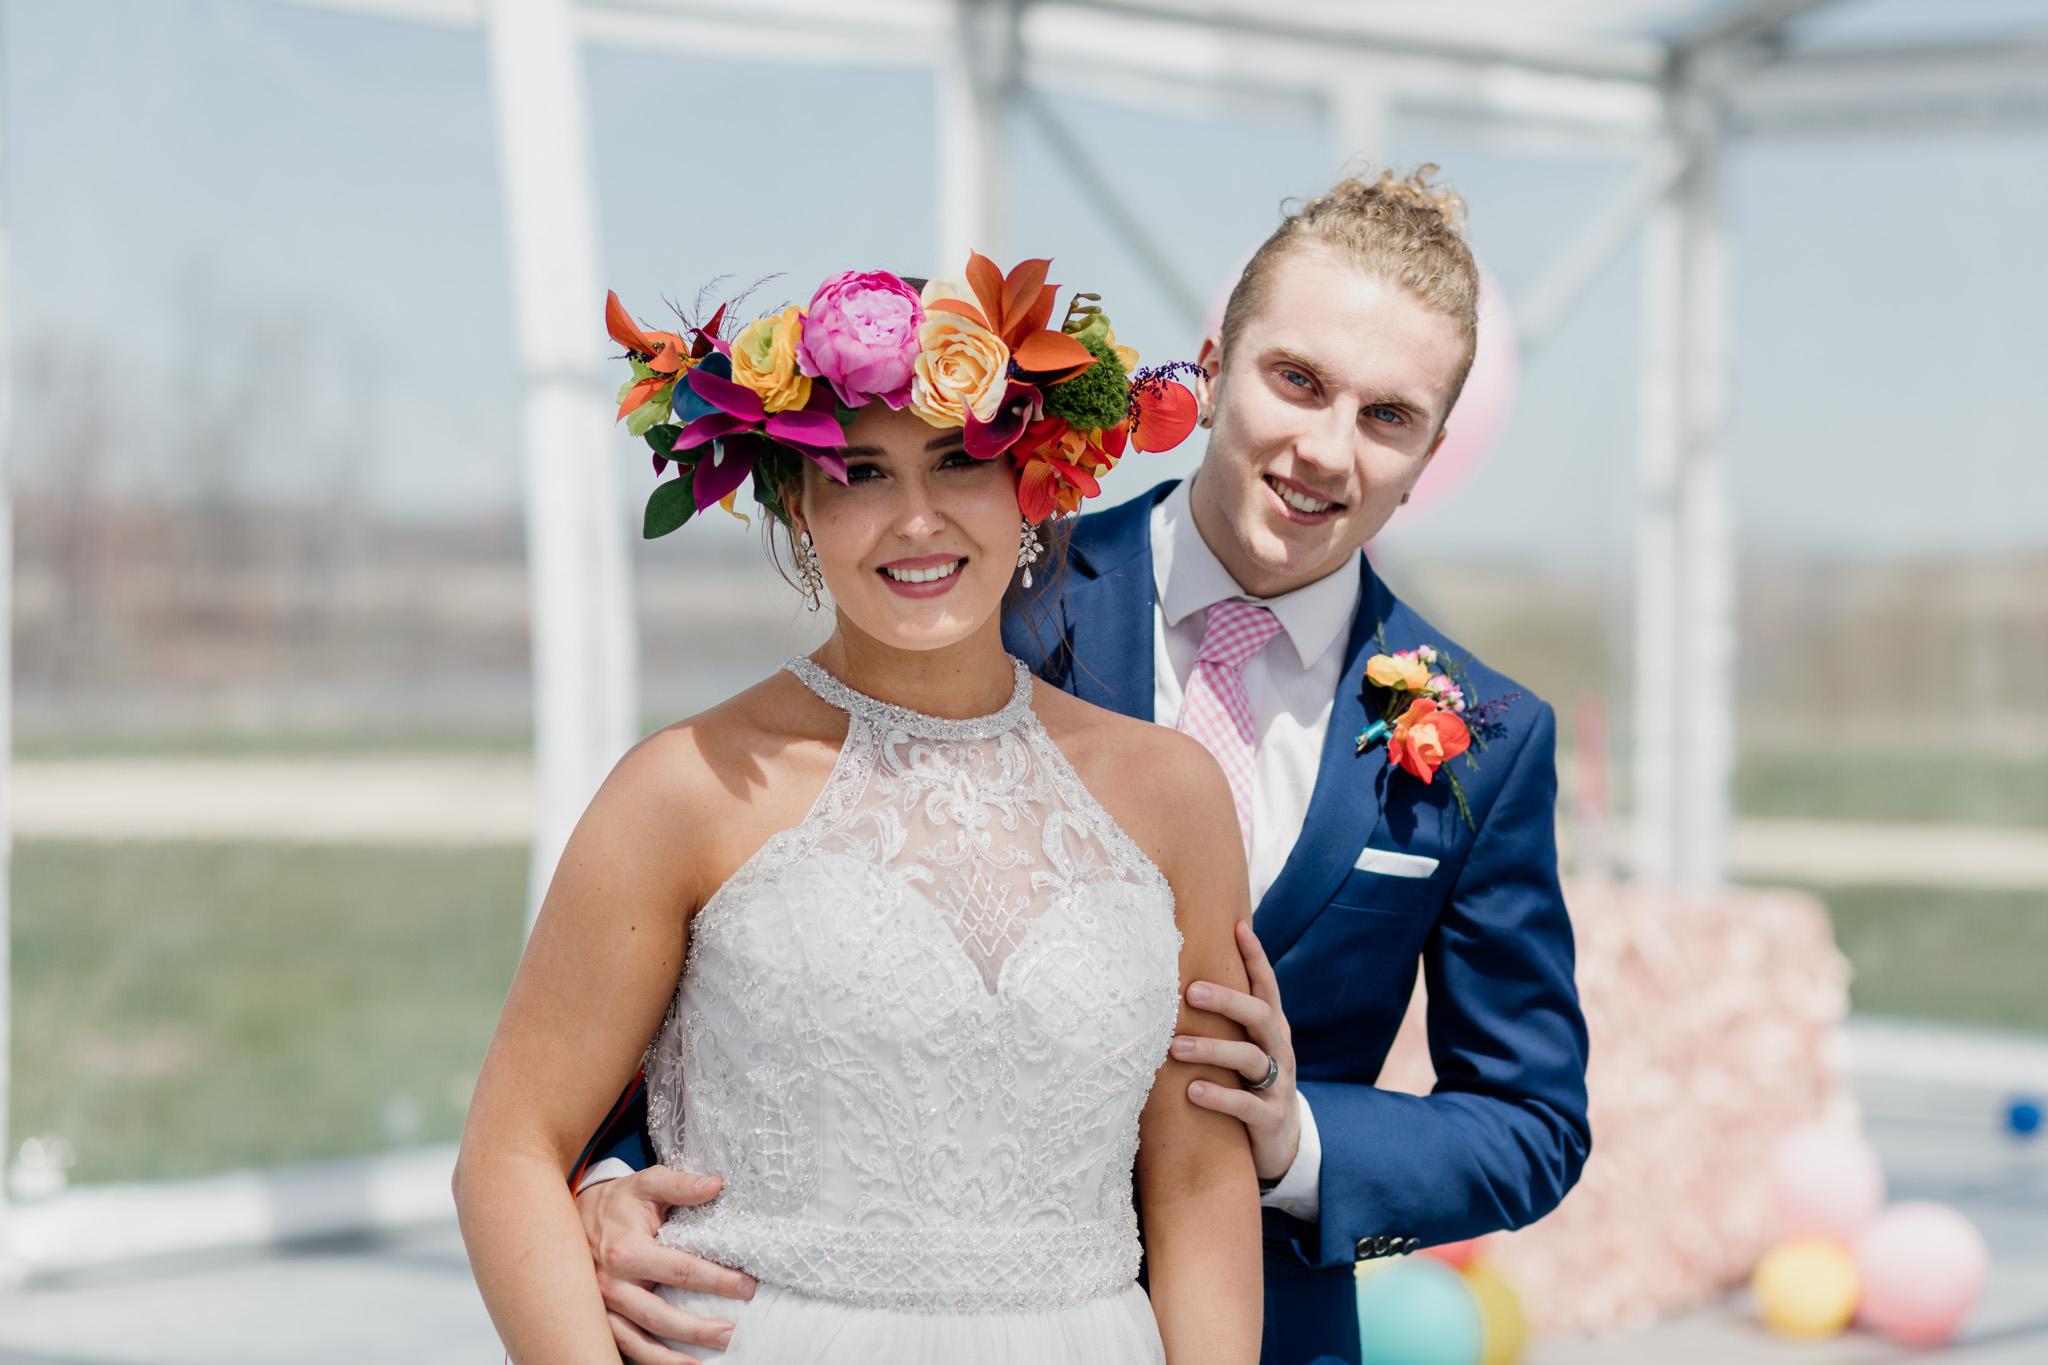 winnipeg-wedding-starlit point-44.jpg